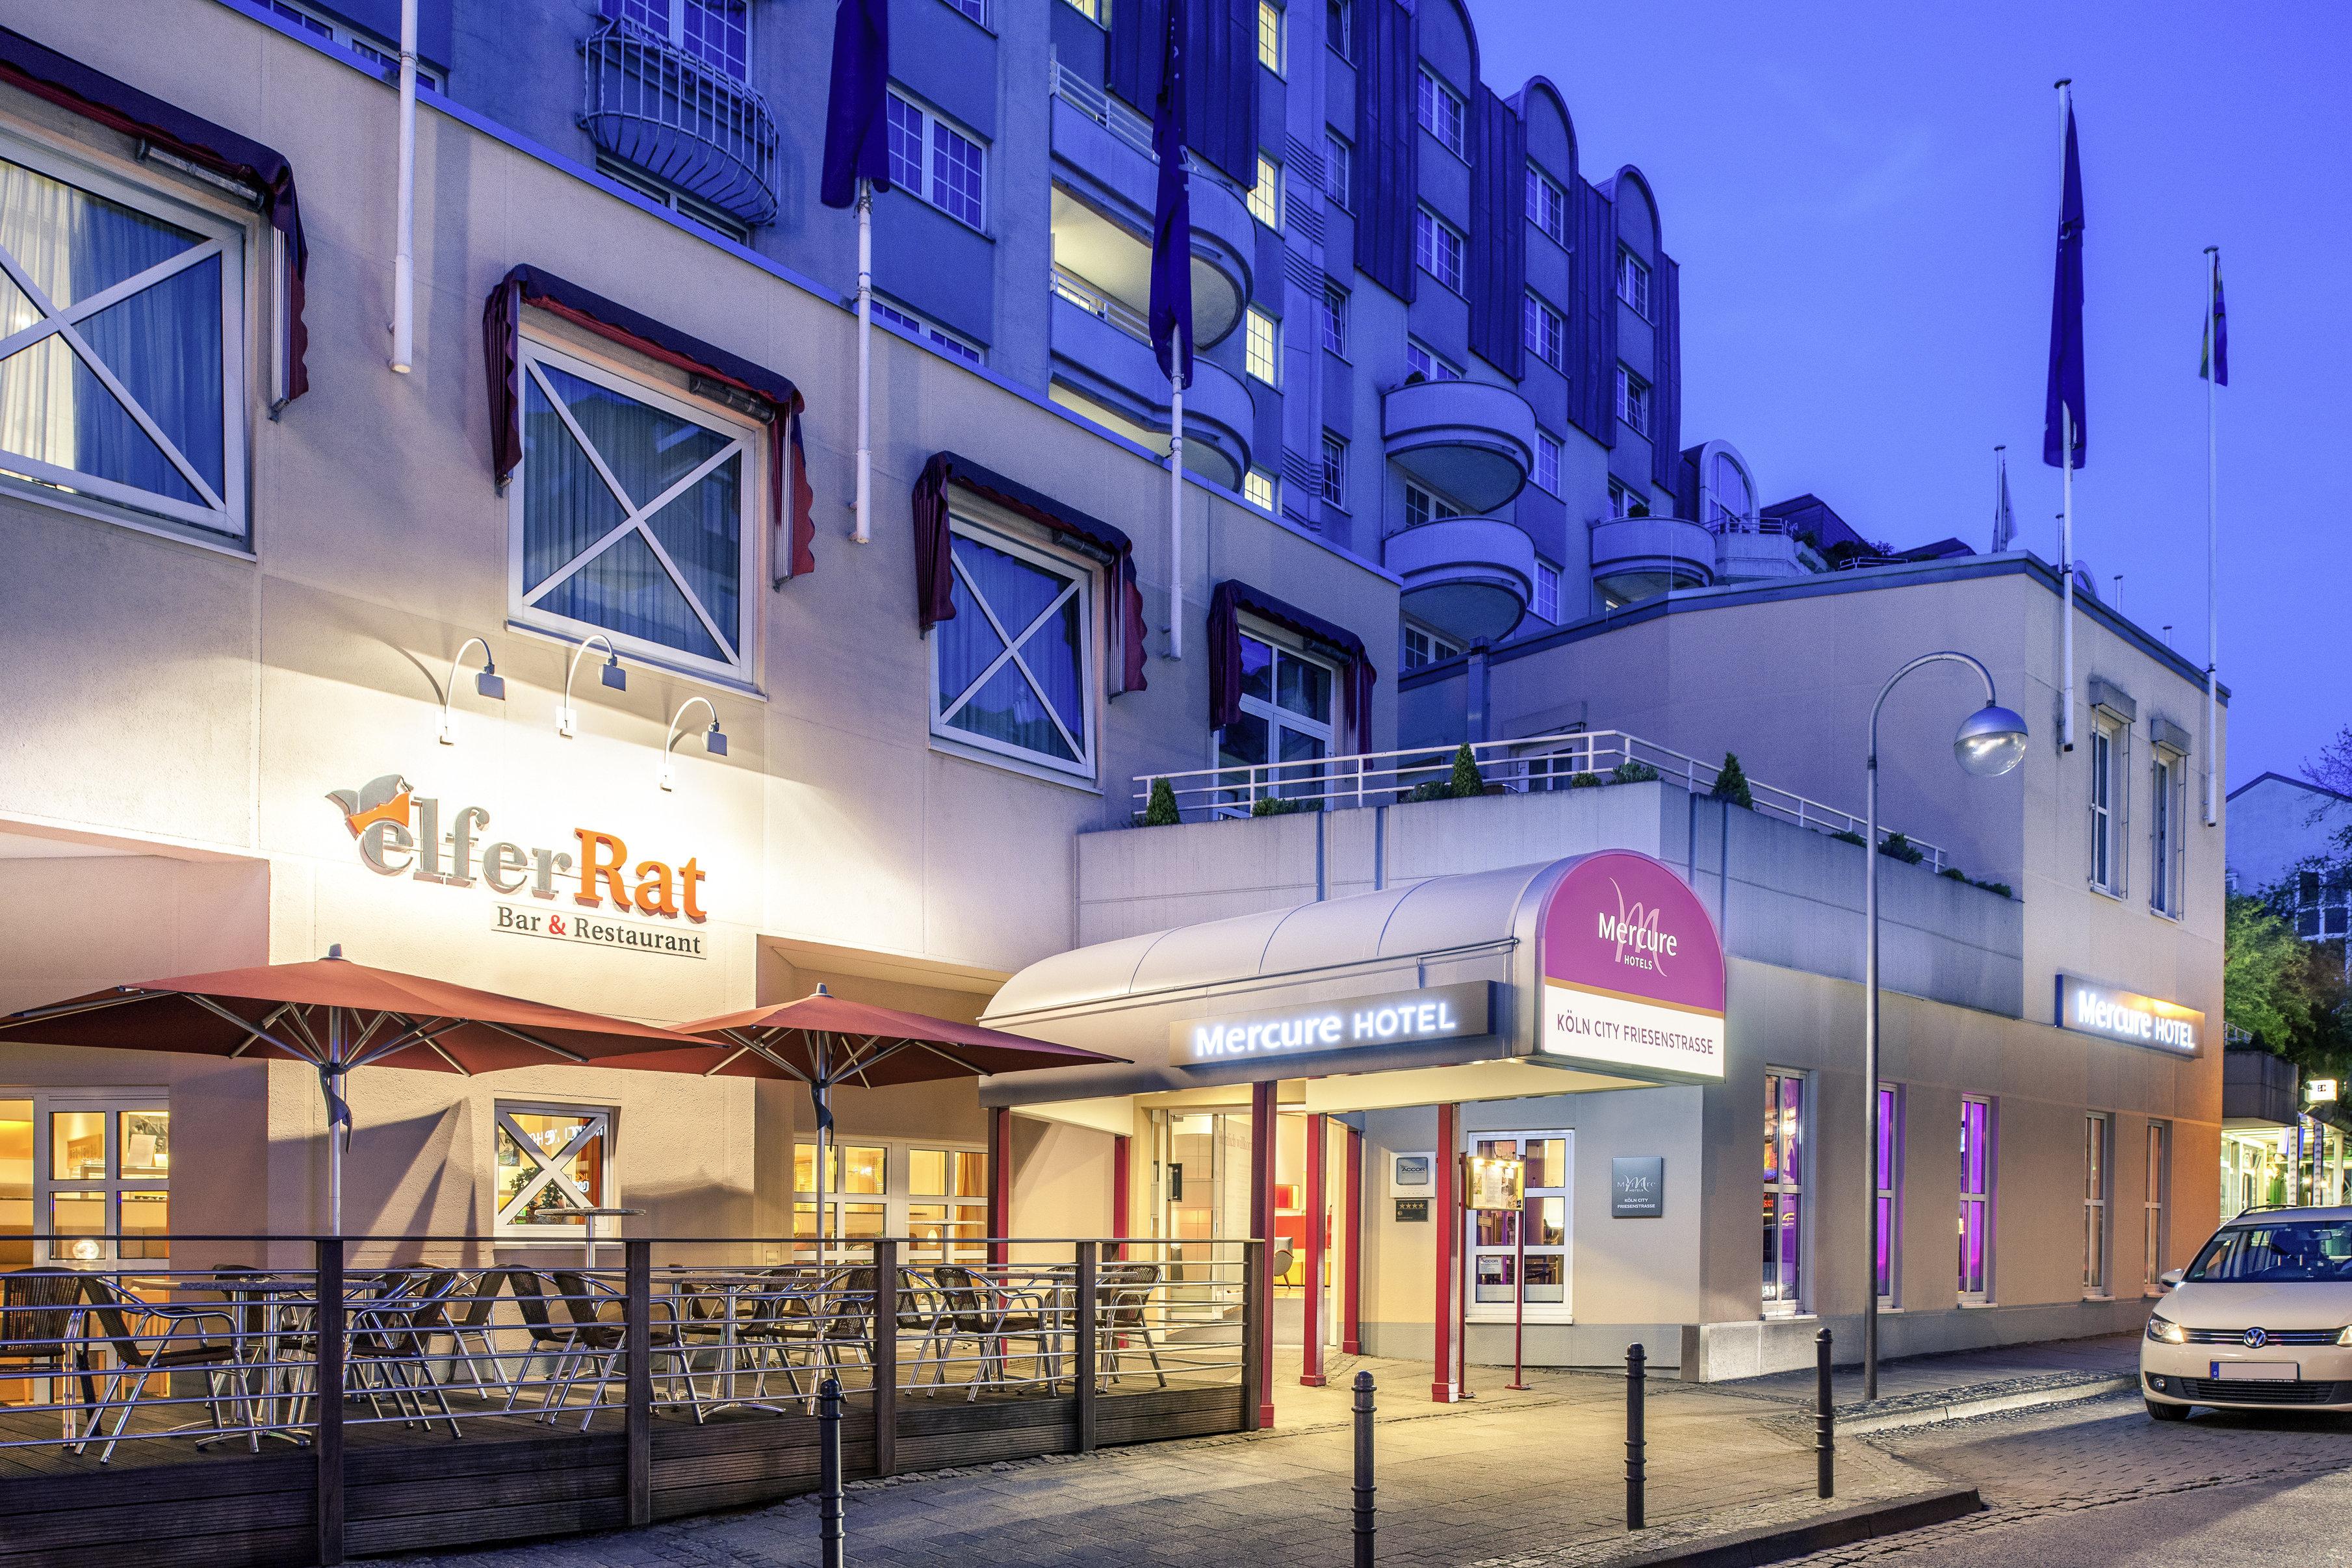 mercure hotel koeln city friesenstrasse - köln günstig bei hotel de, Badezimmer ideen